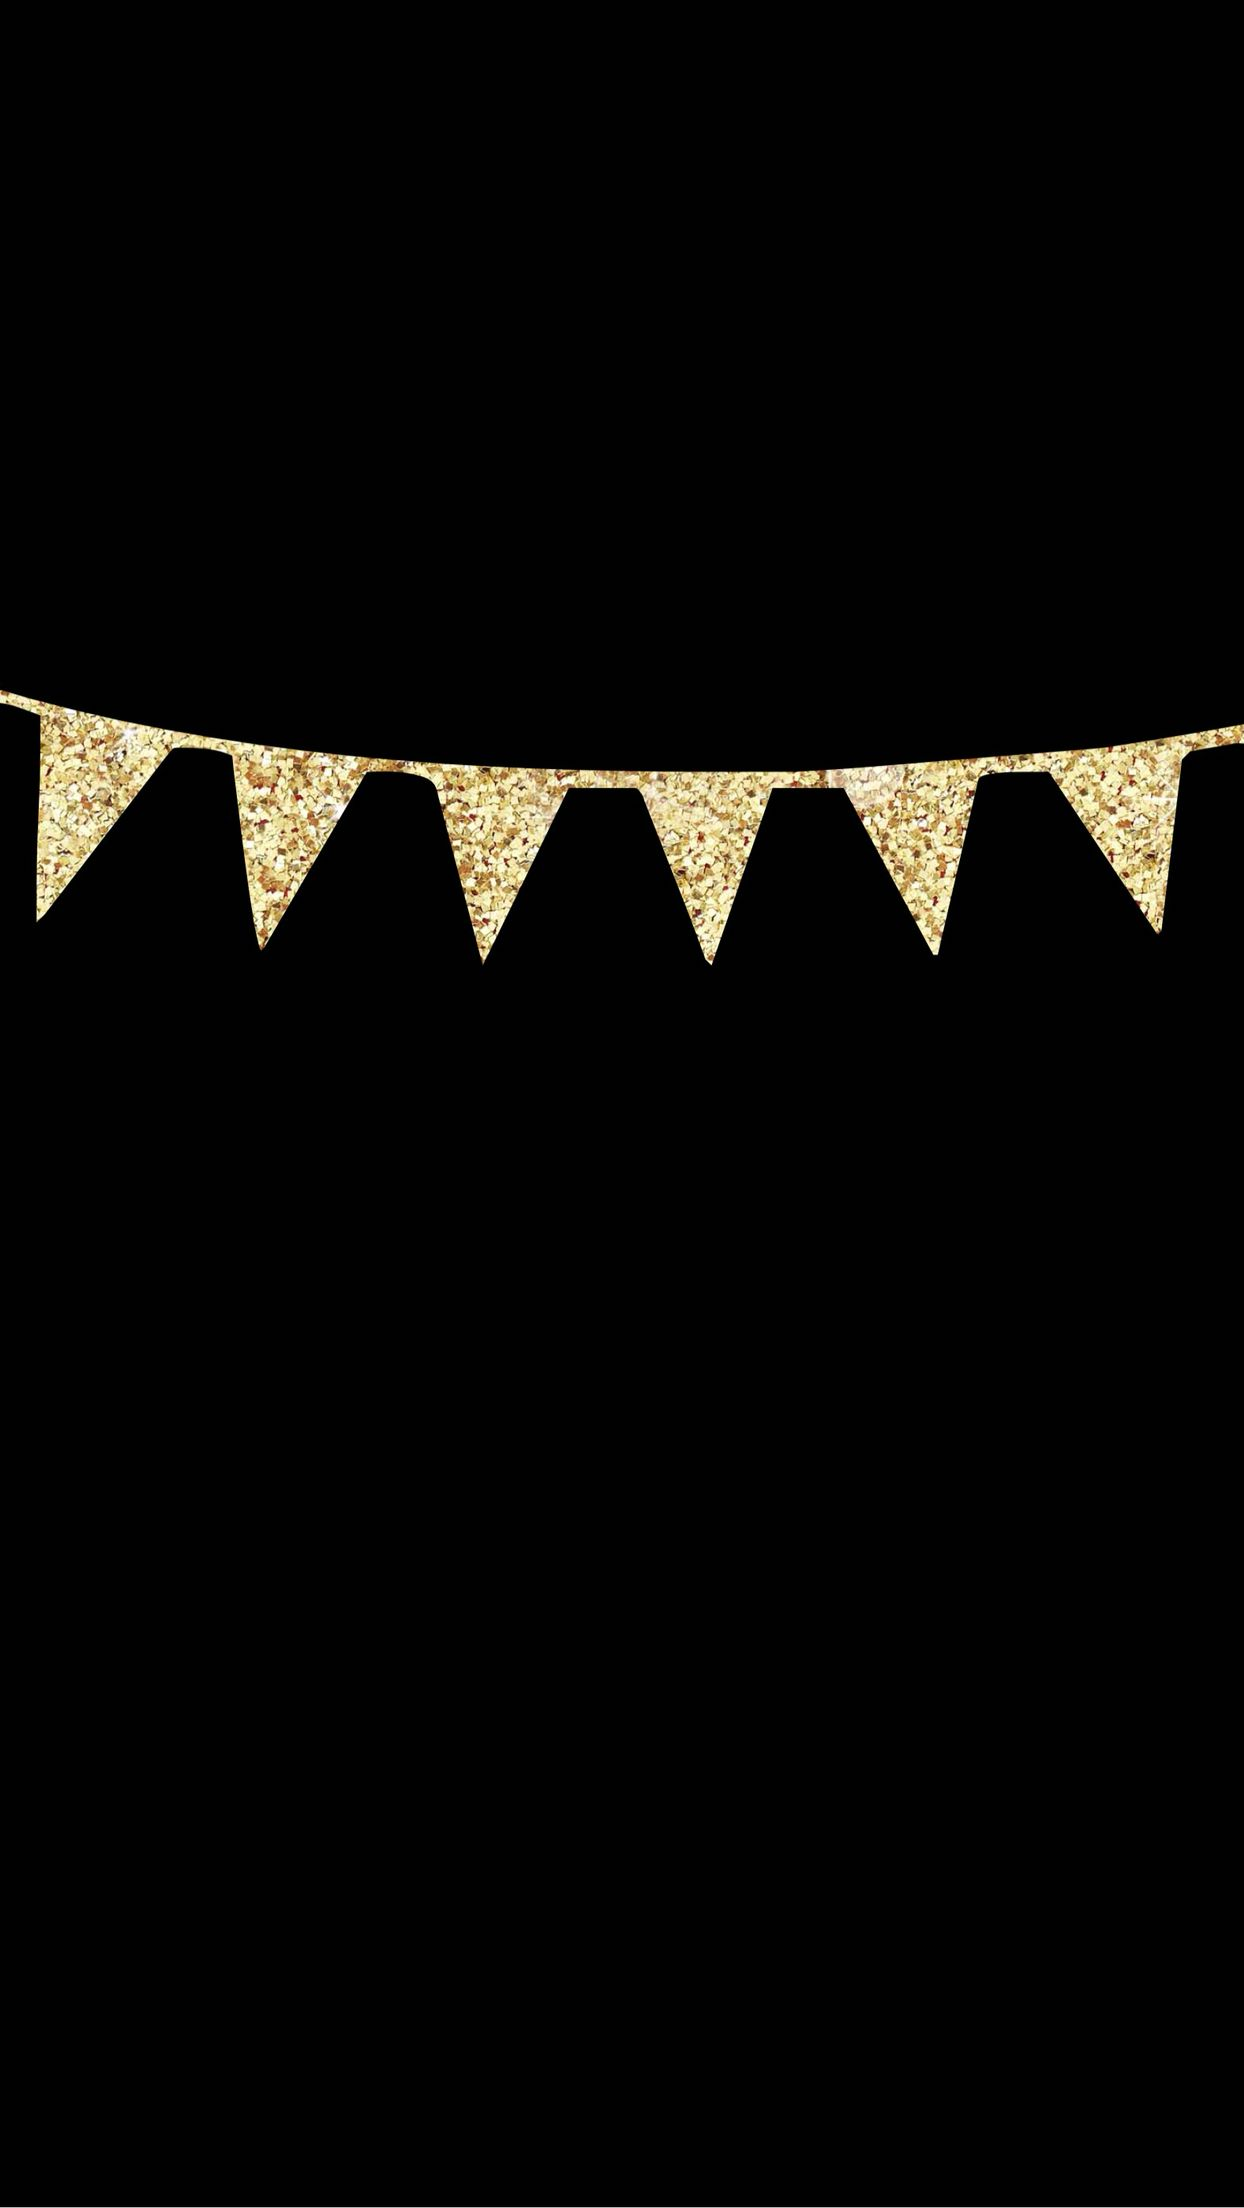 IPhone 6 Plus Lock Screen Wallpaper Black With Gold Glitter